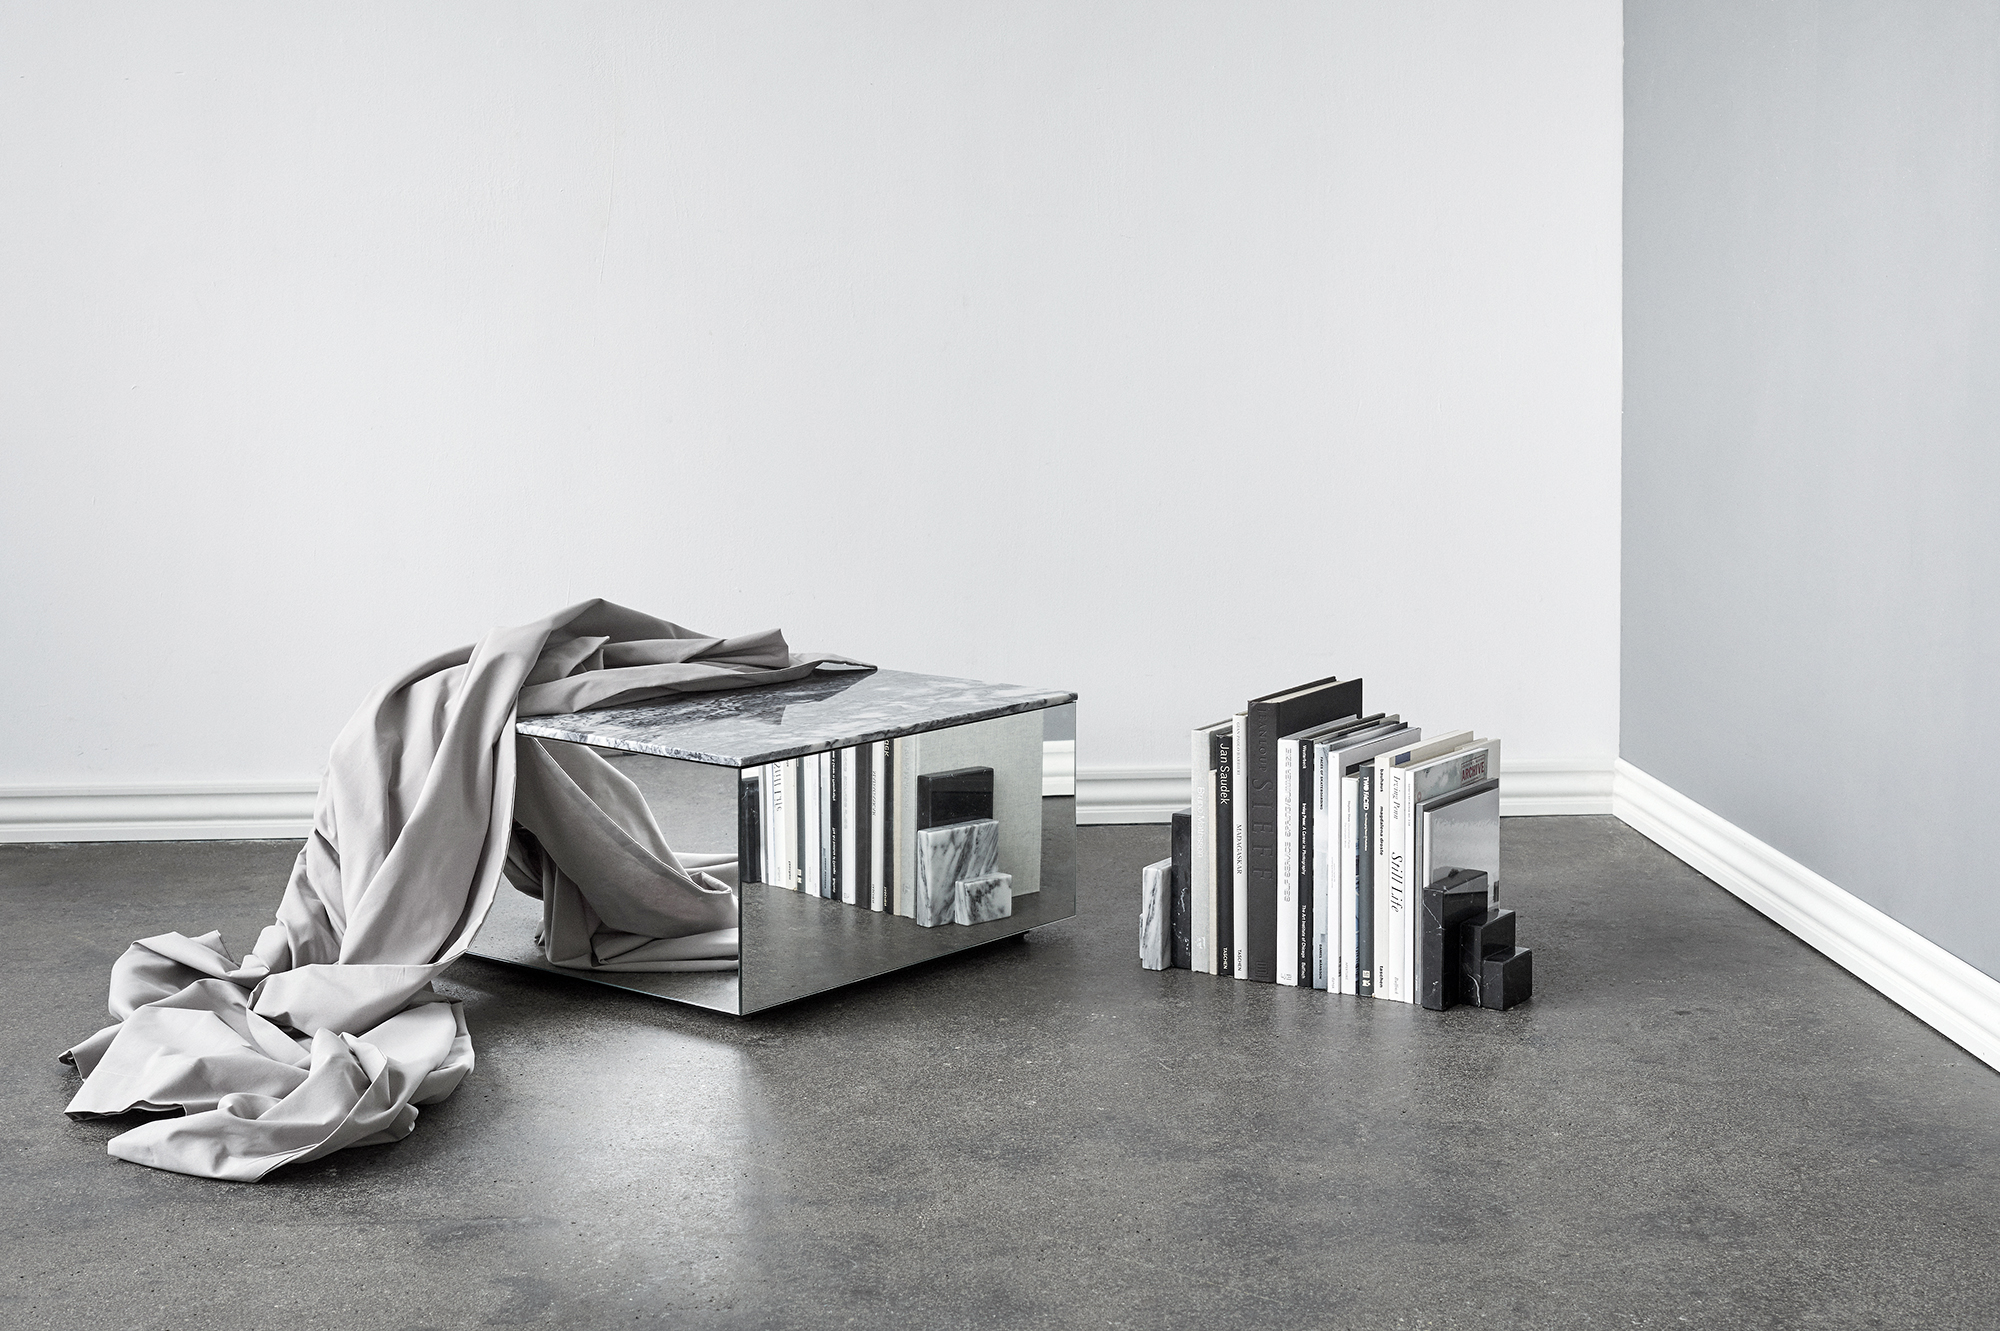 Sculptural minimalism by Kristina Dam, Copenahagen